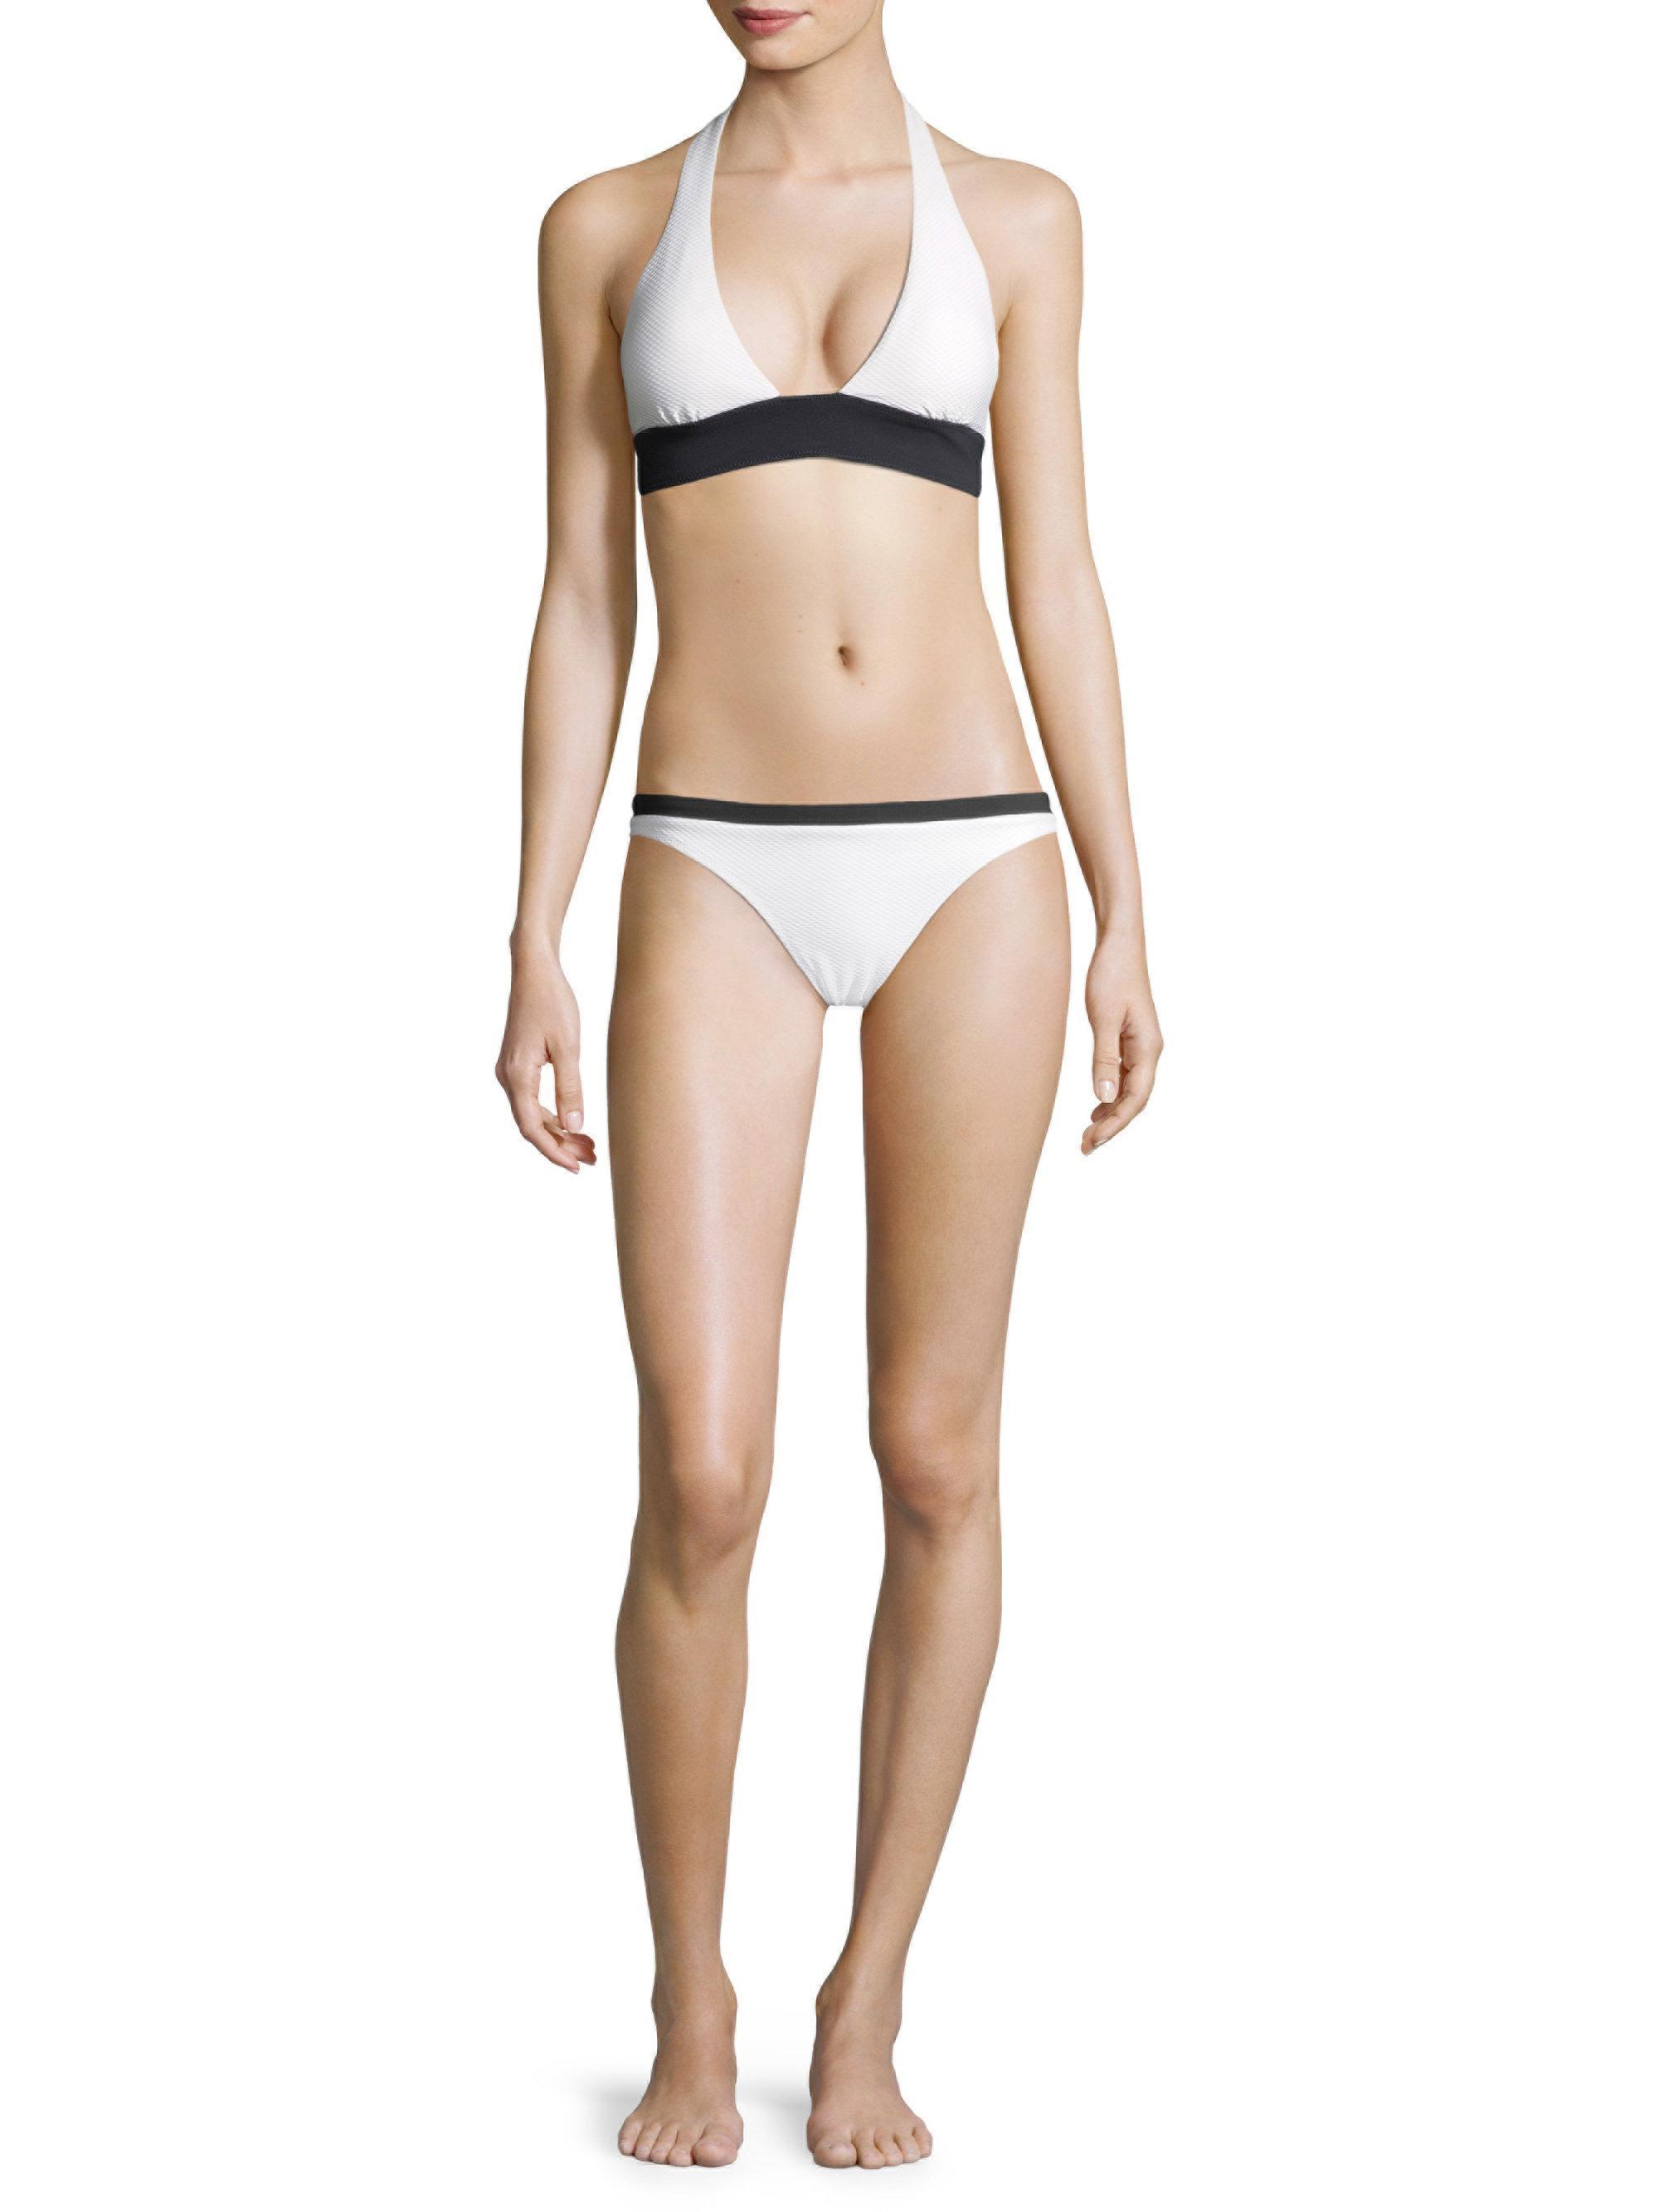 59902aed93 Heidi Klein Halter Padded Bikini Top in White - Lyst